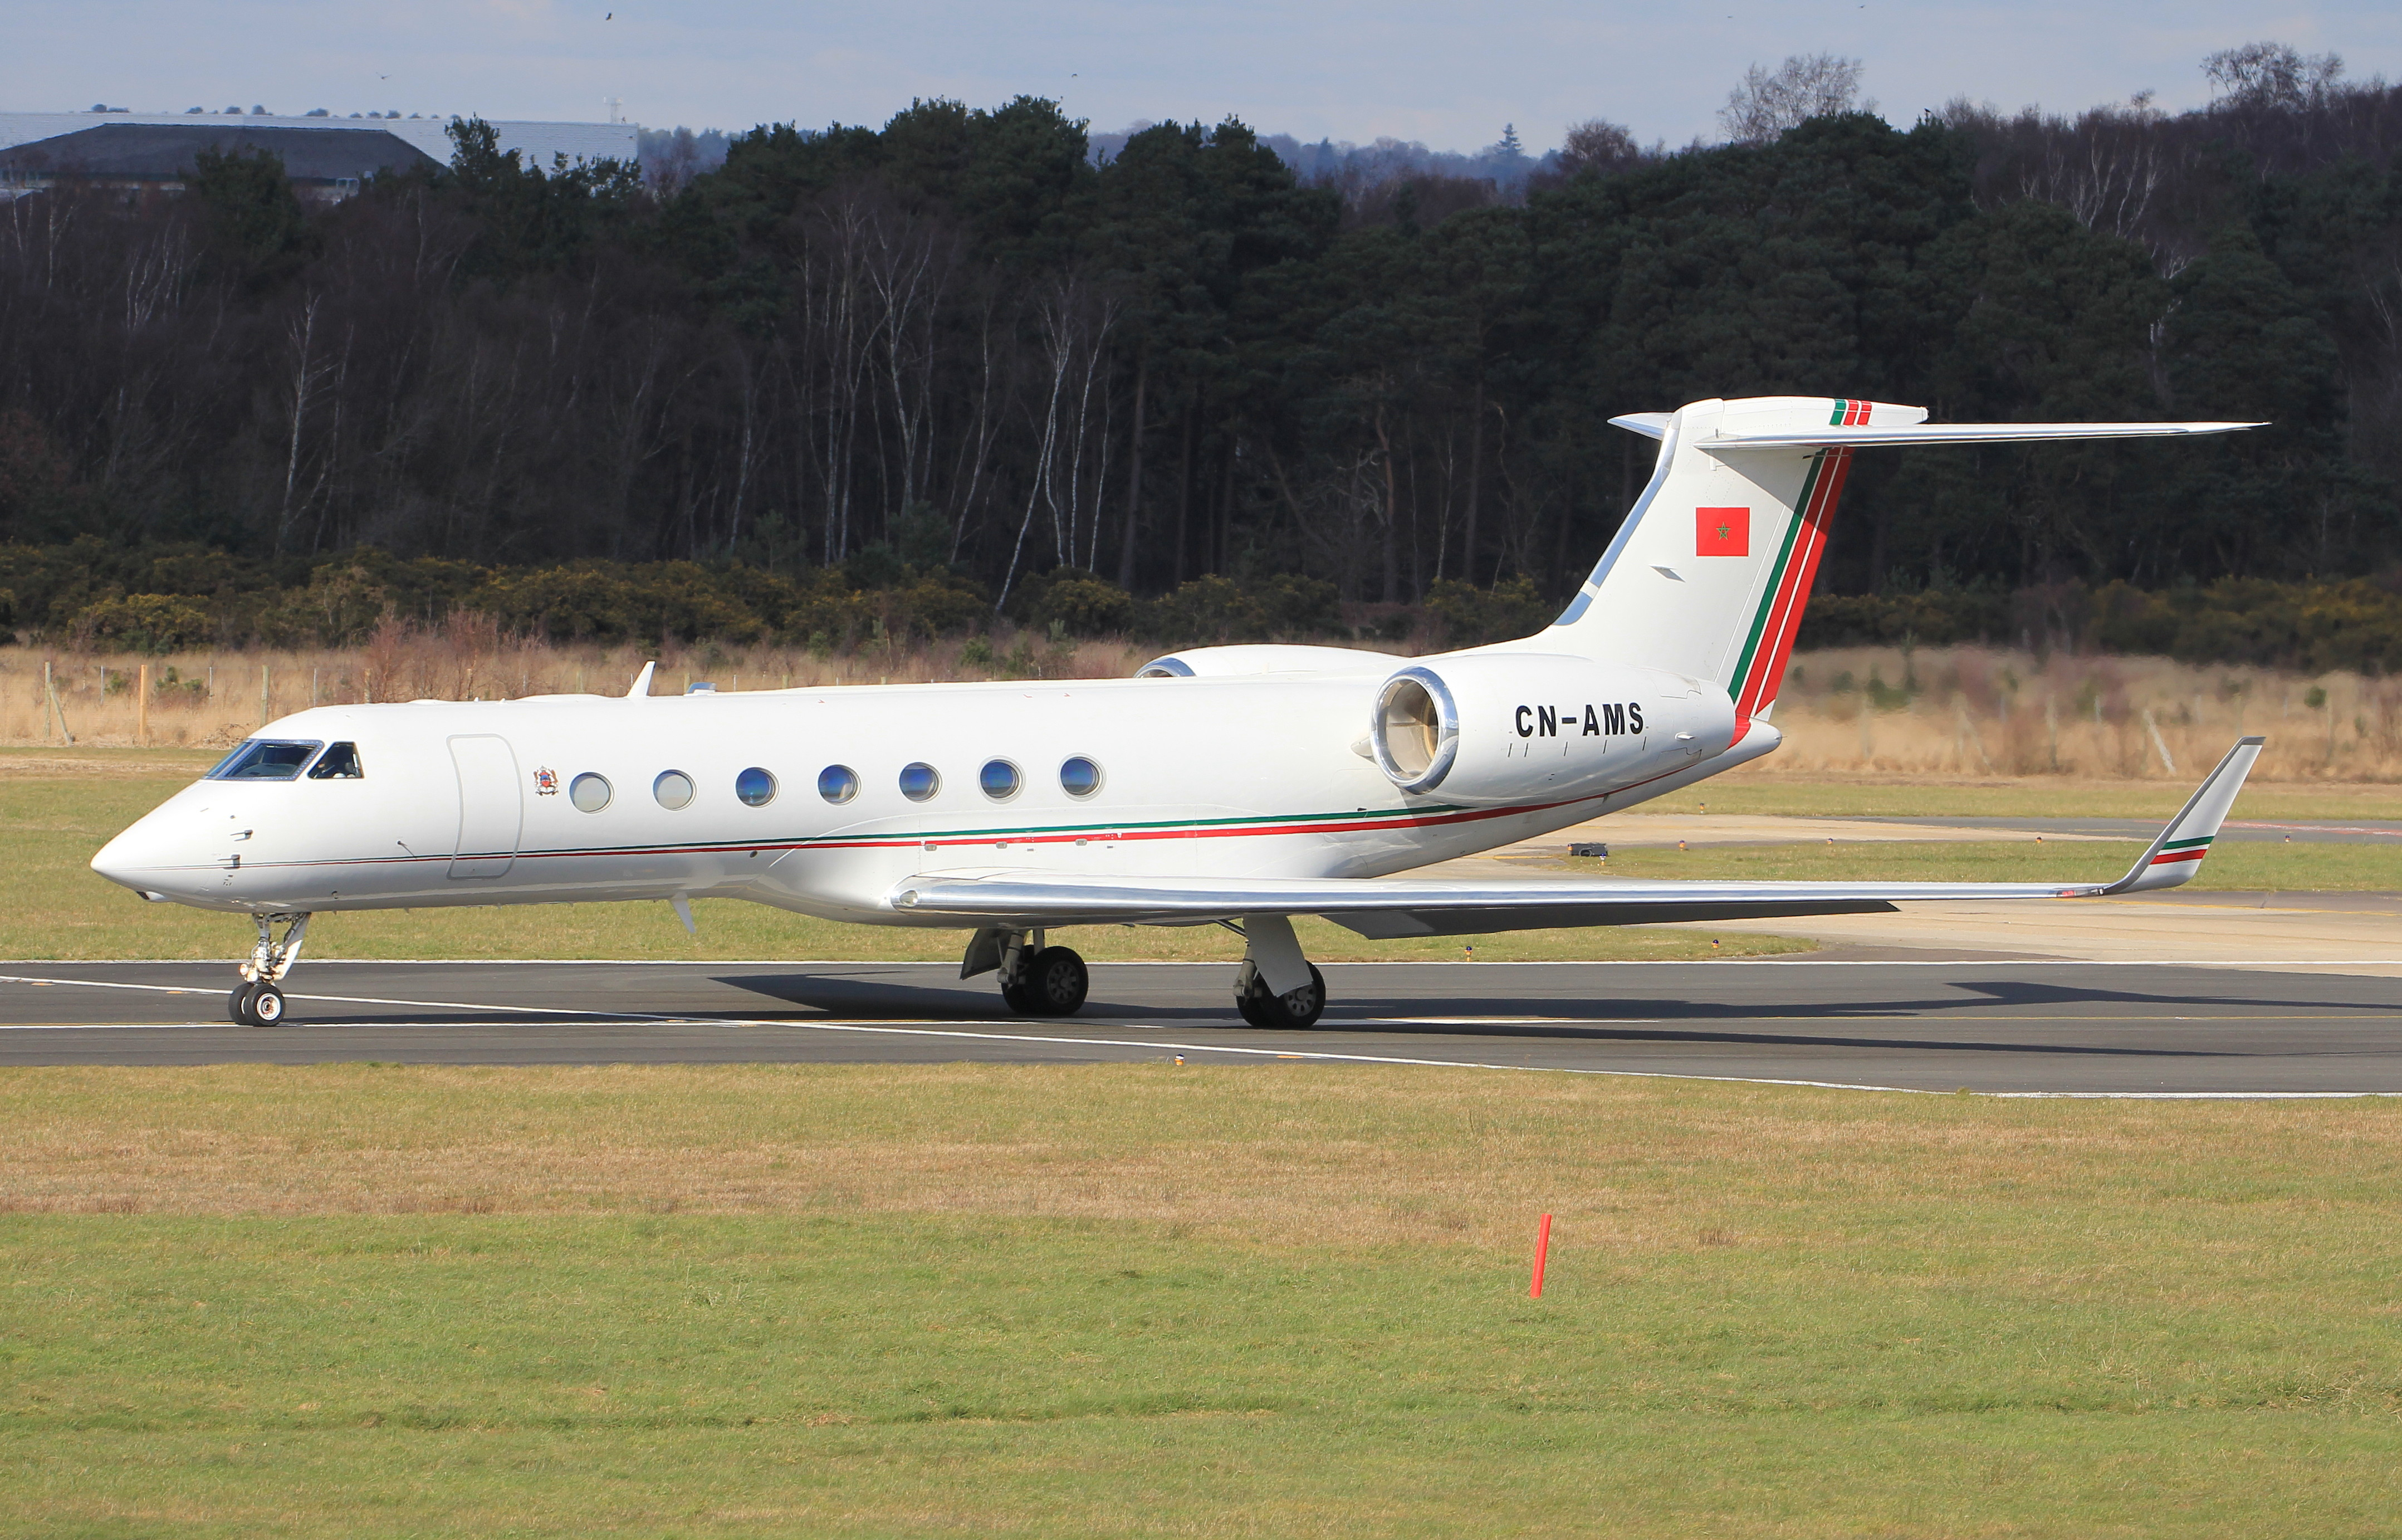 FRA: Avions VIP, Liaison & ECM - Page 12 25475733582_74b9aab135_o